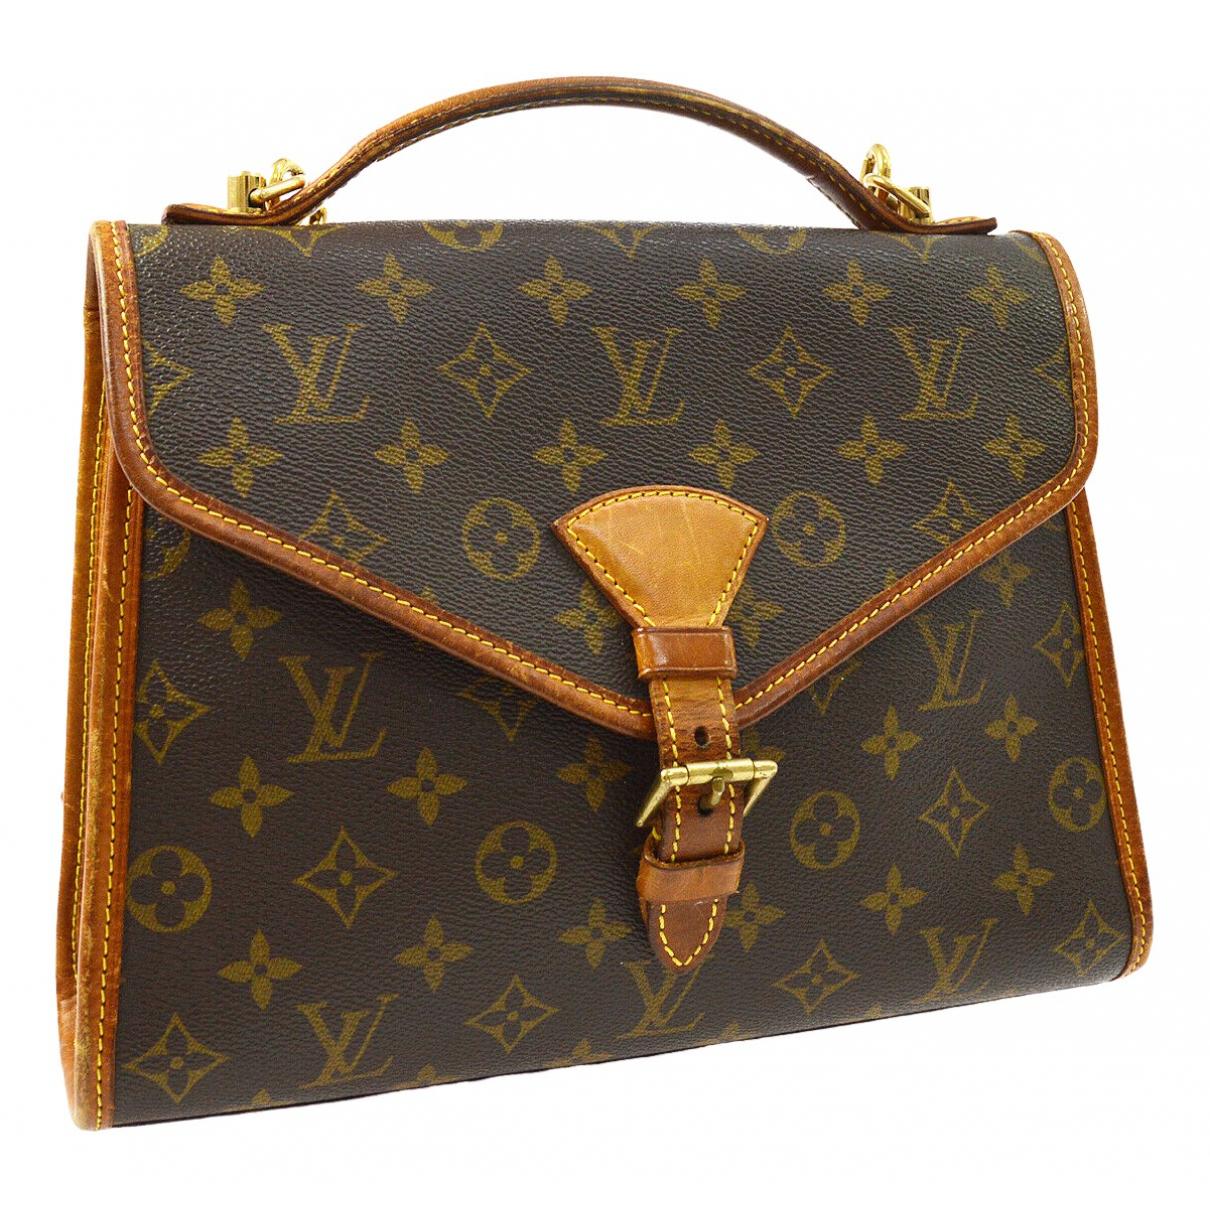 Bolso  Bel Air de Lona Louis Vuitton